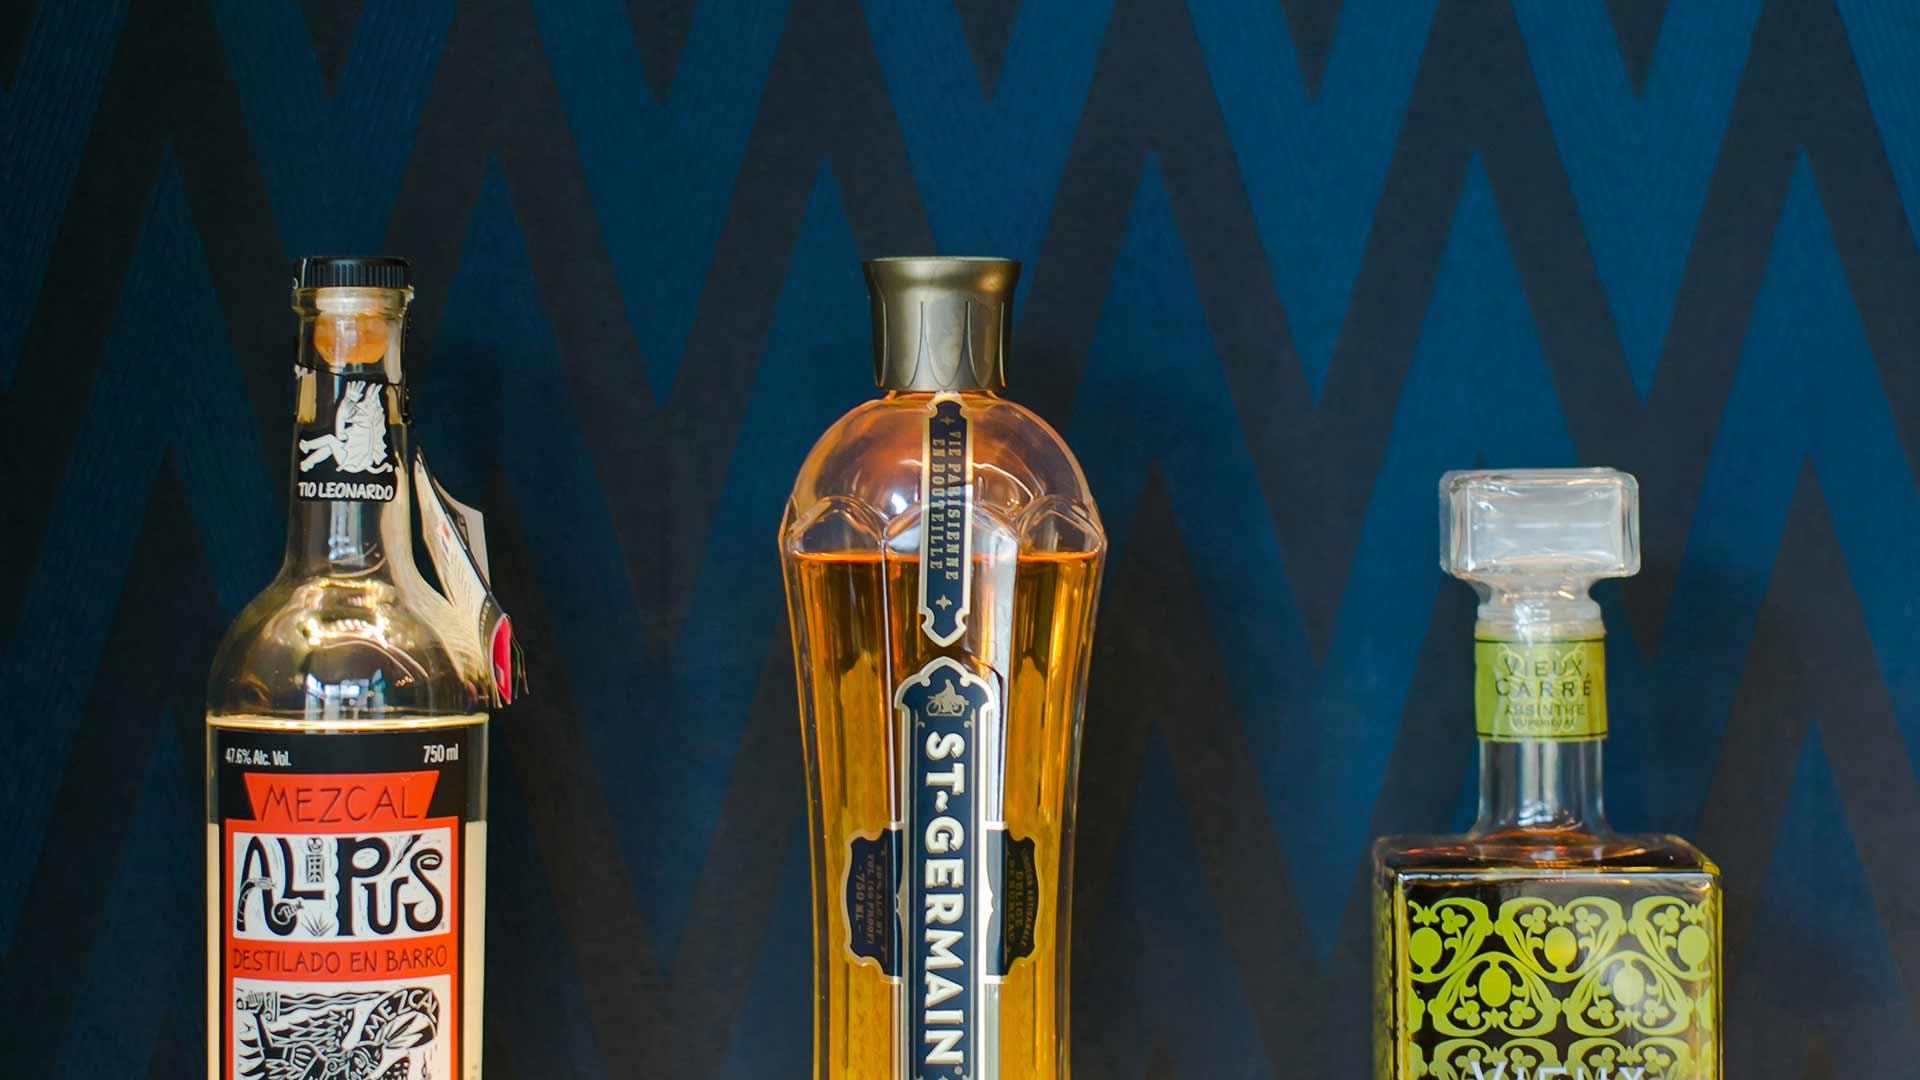 Bottle Elevation Detail - Midcentury Modern Addition (Cigar Room) - Brendonwood, Indianapolis